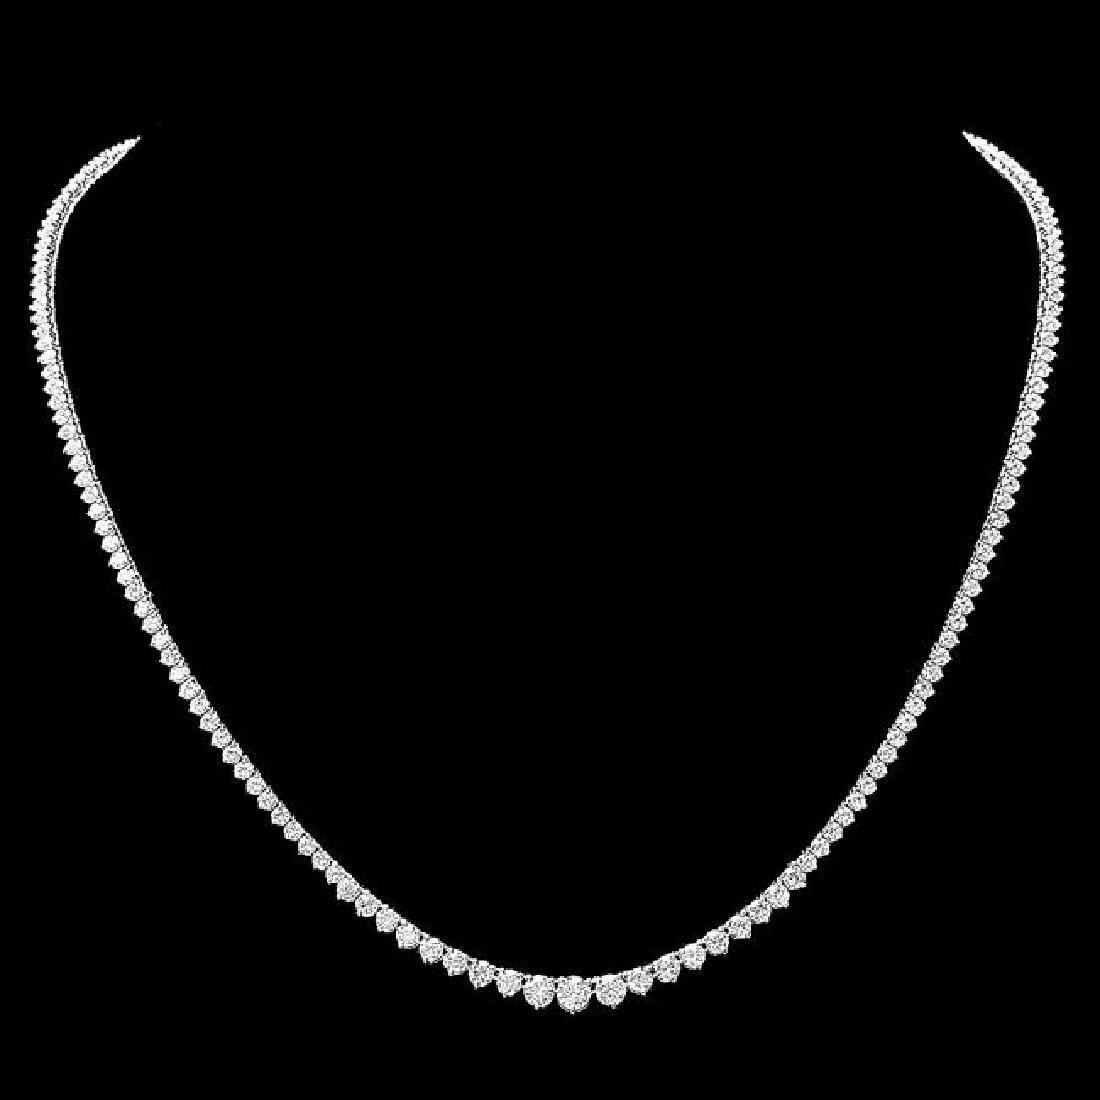 18k White Gold 8.50ct Diamond Necklace